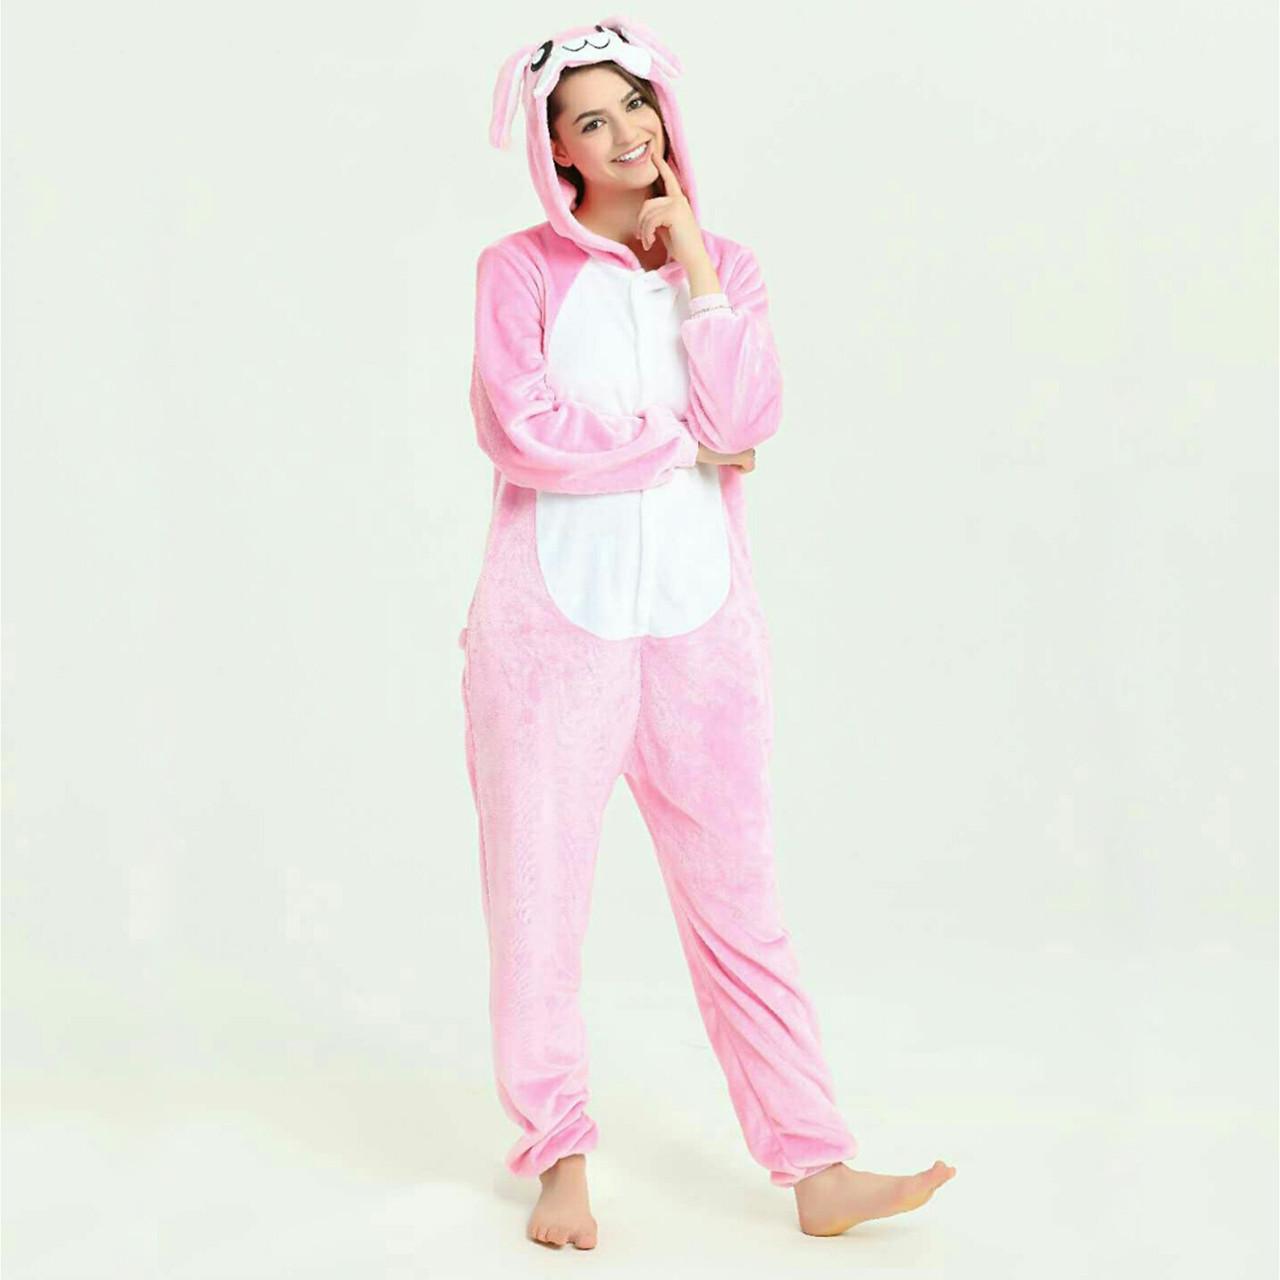 Пижамы кигуруми Заяц розовый для взрослых забавная подростковая пижама комбинезон кигуруми, размер M-L L